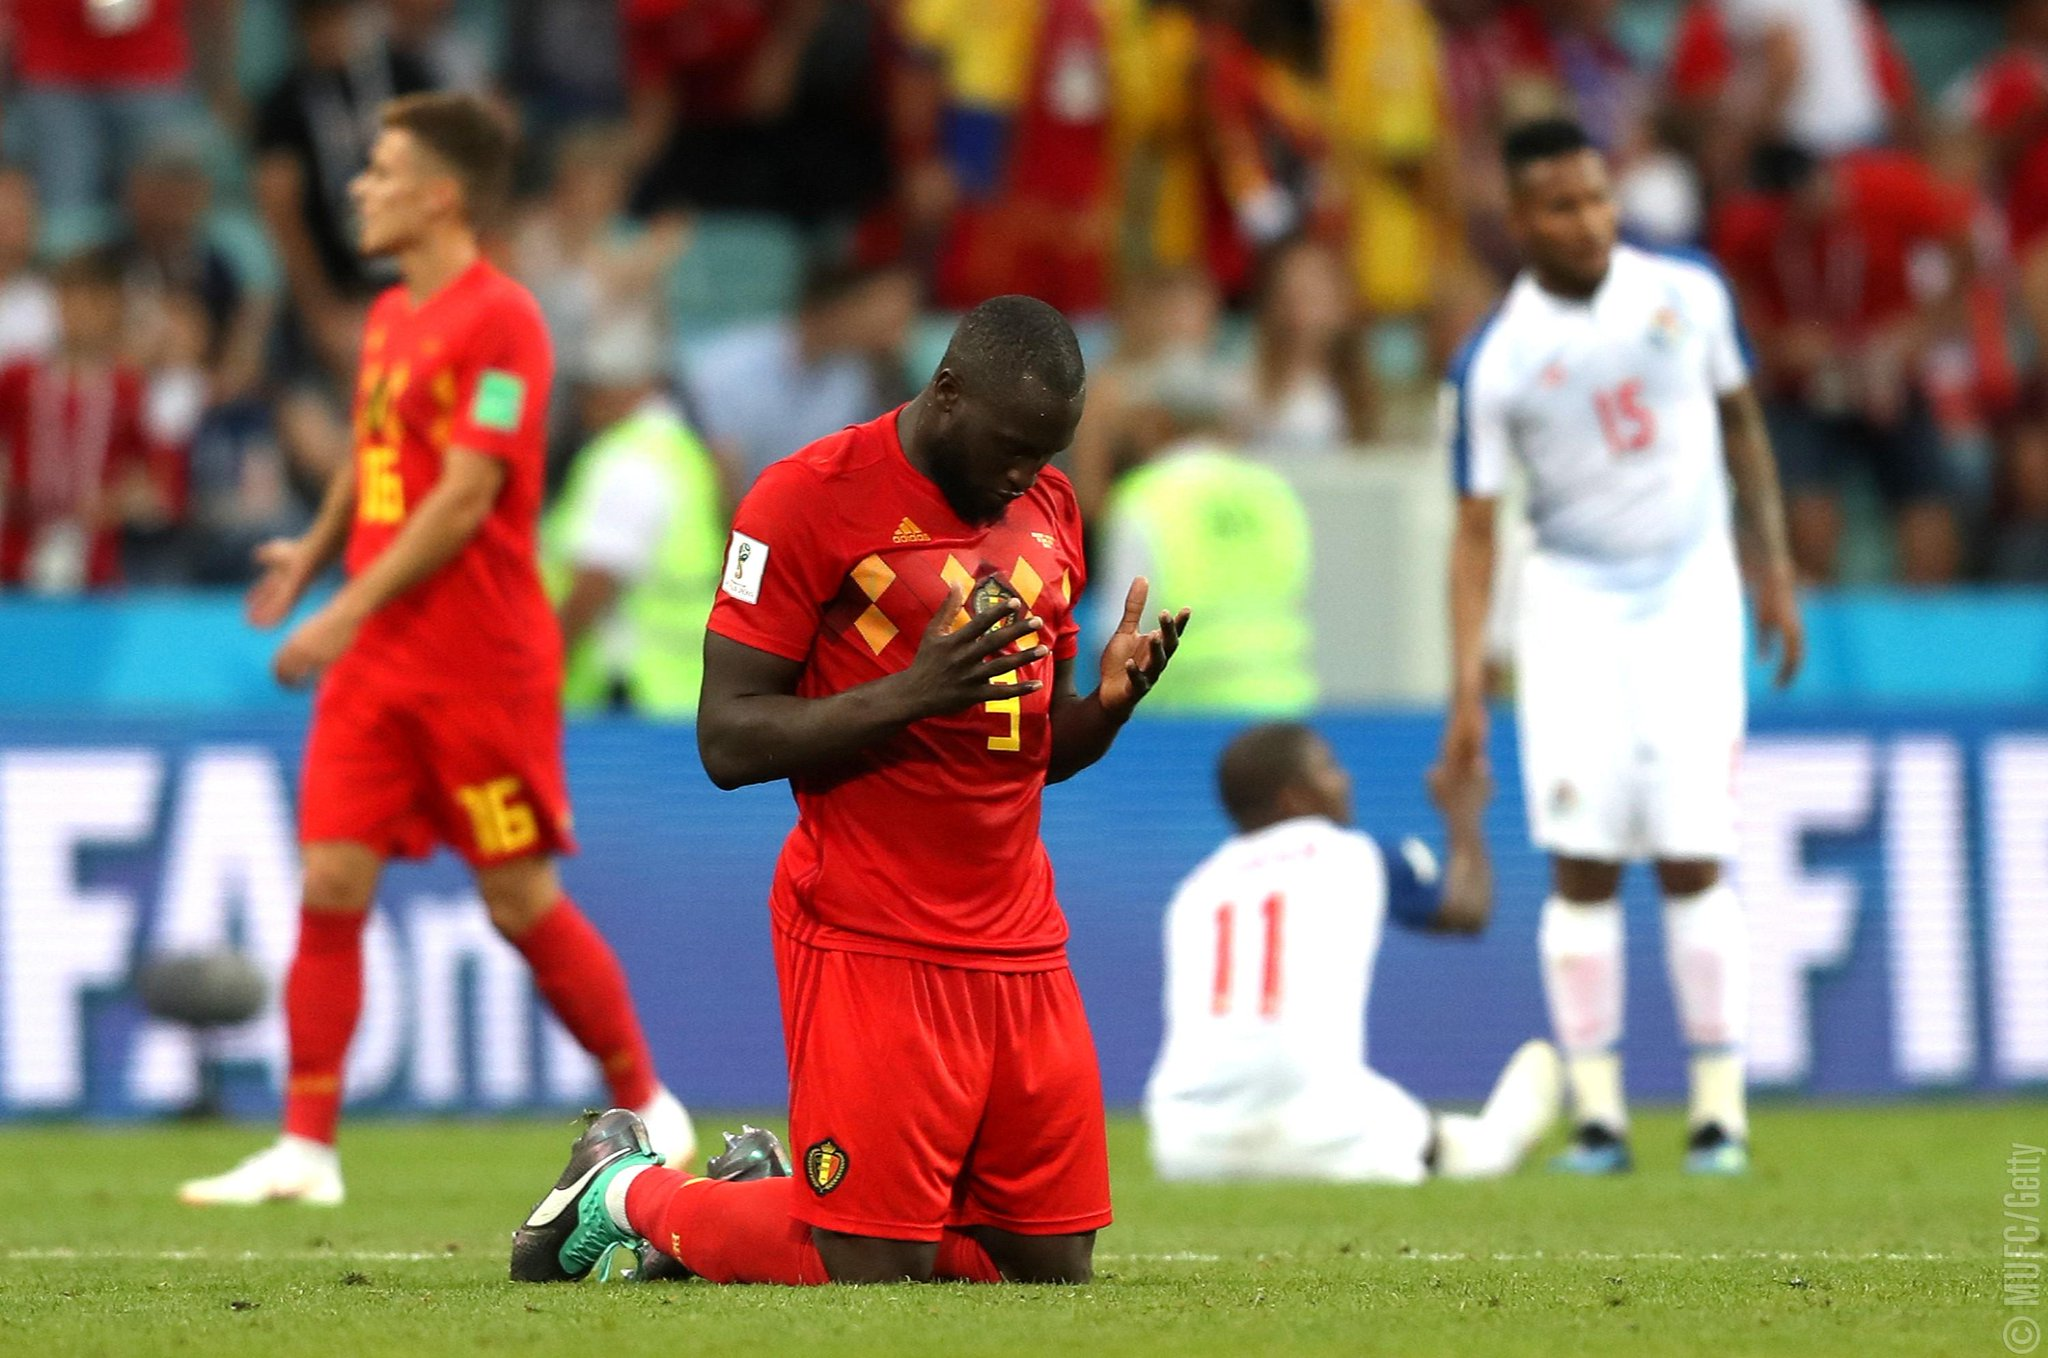 .@RomeluLukaku9 has scored 1️⃣5️⃣ goals in last �� international appearances ������ https://t.co/VUOmkTmDvn